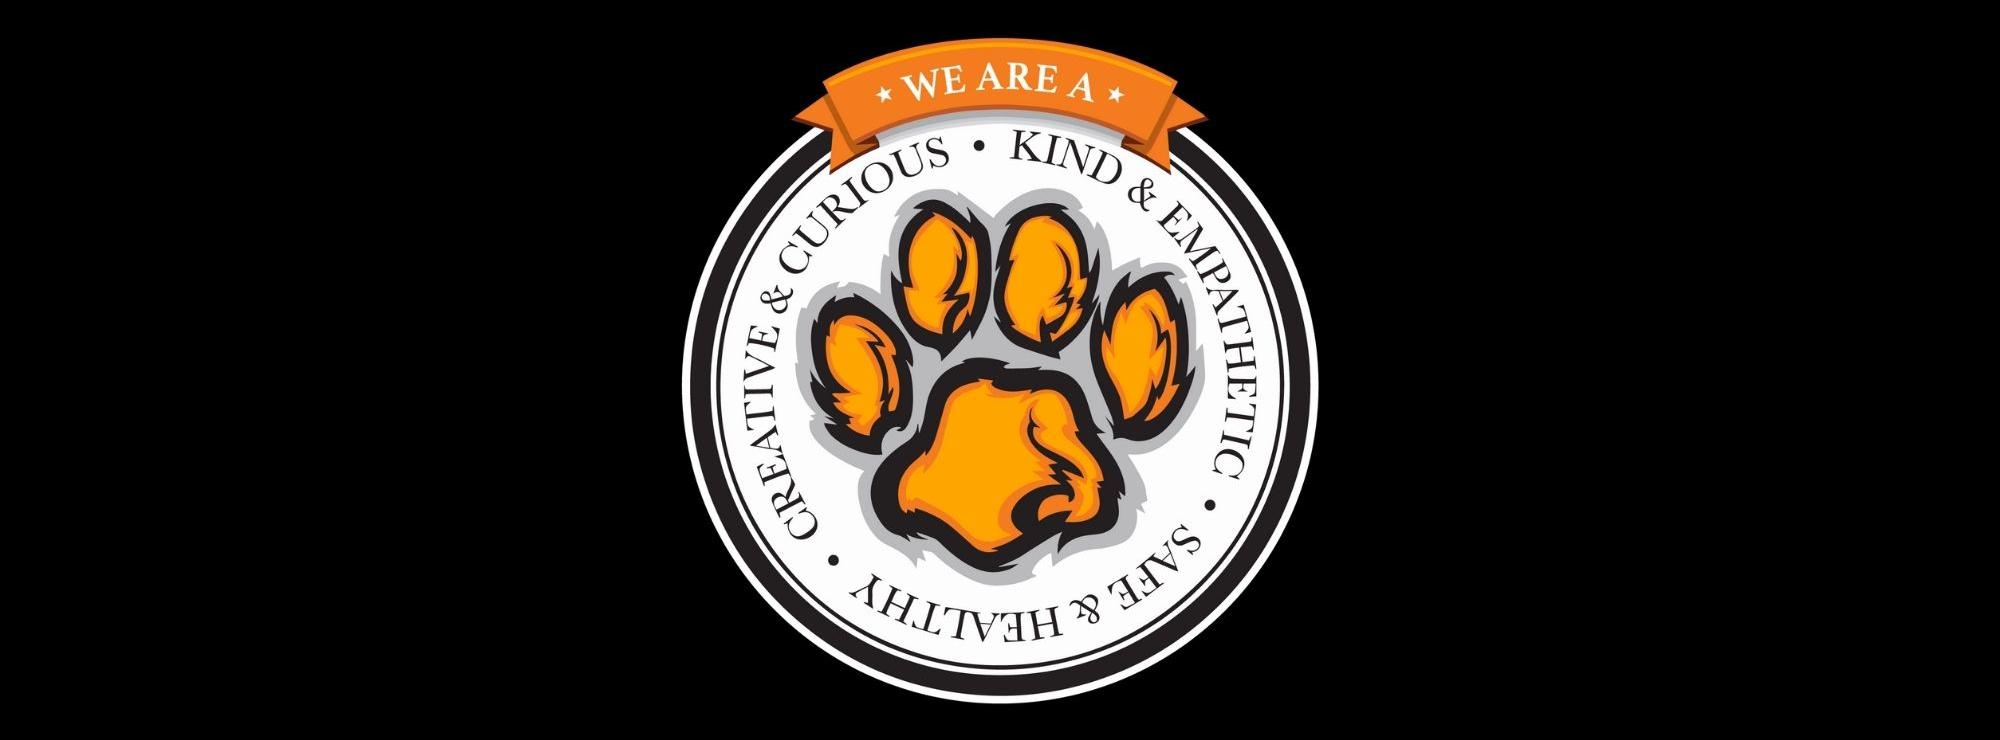 Maynard Public Schools Logo